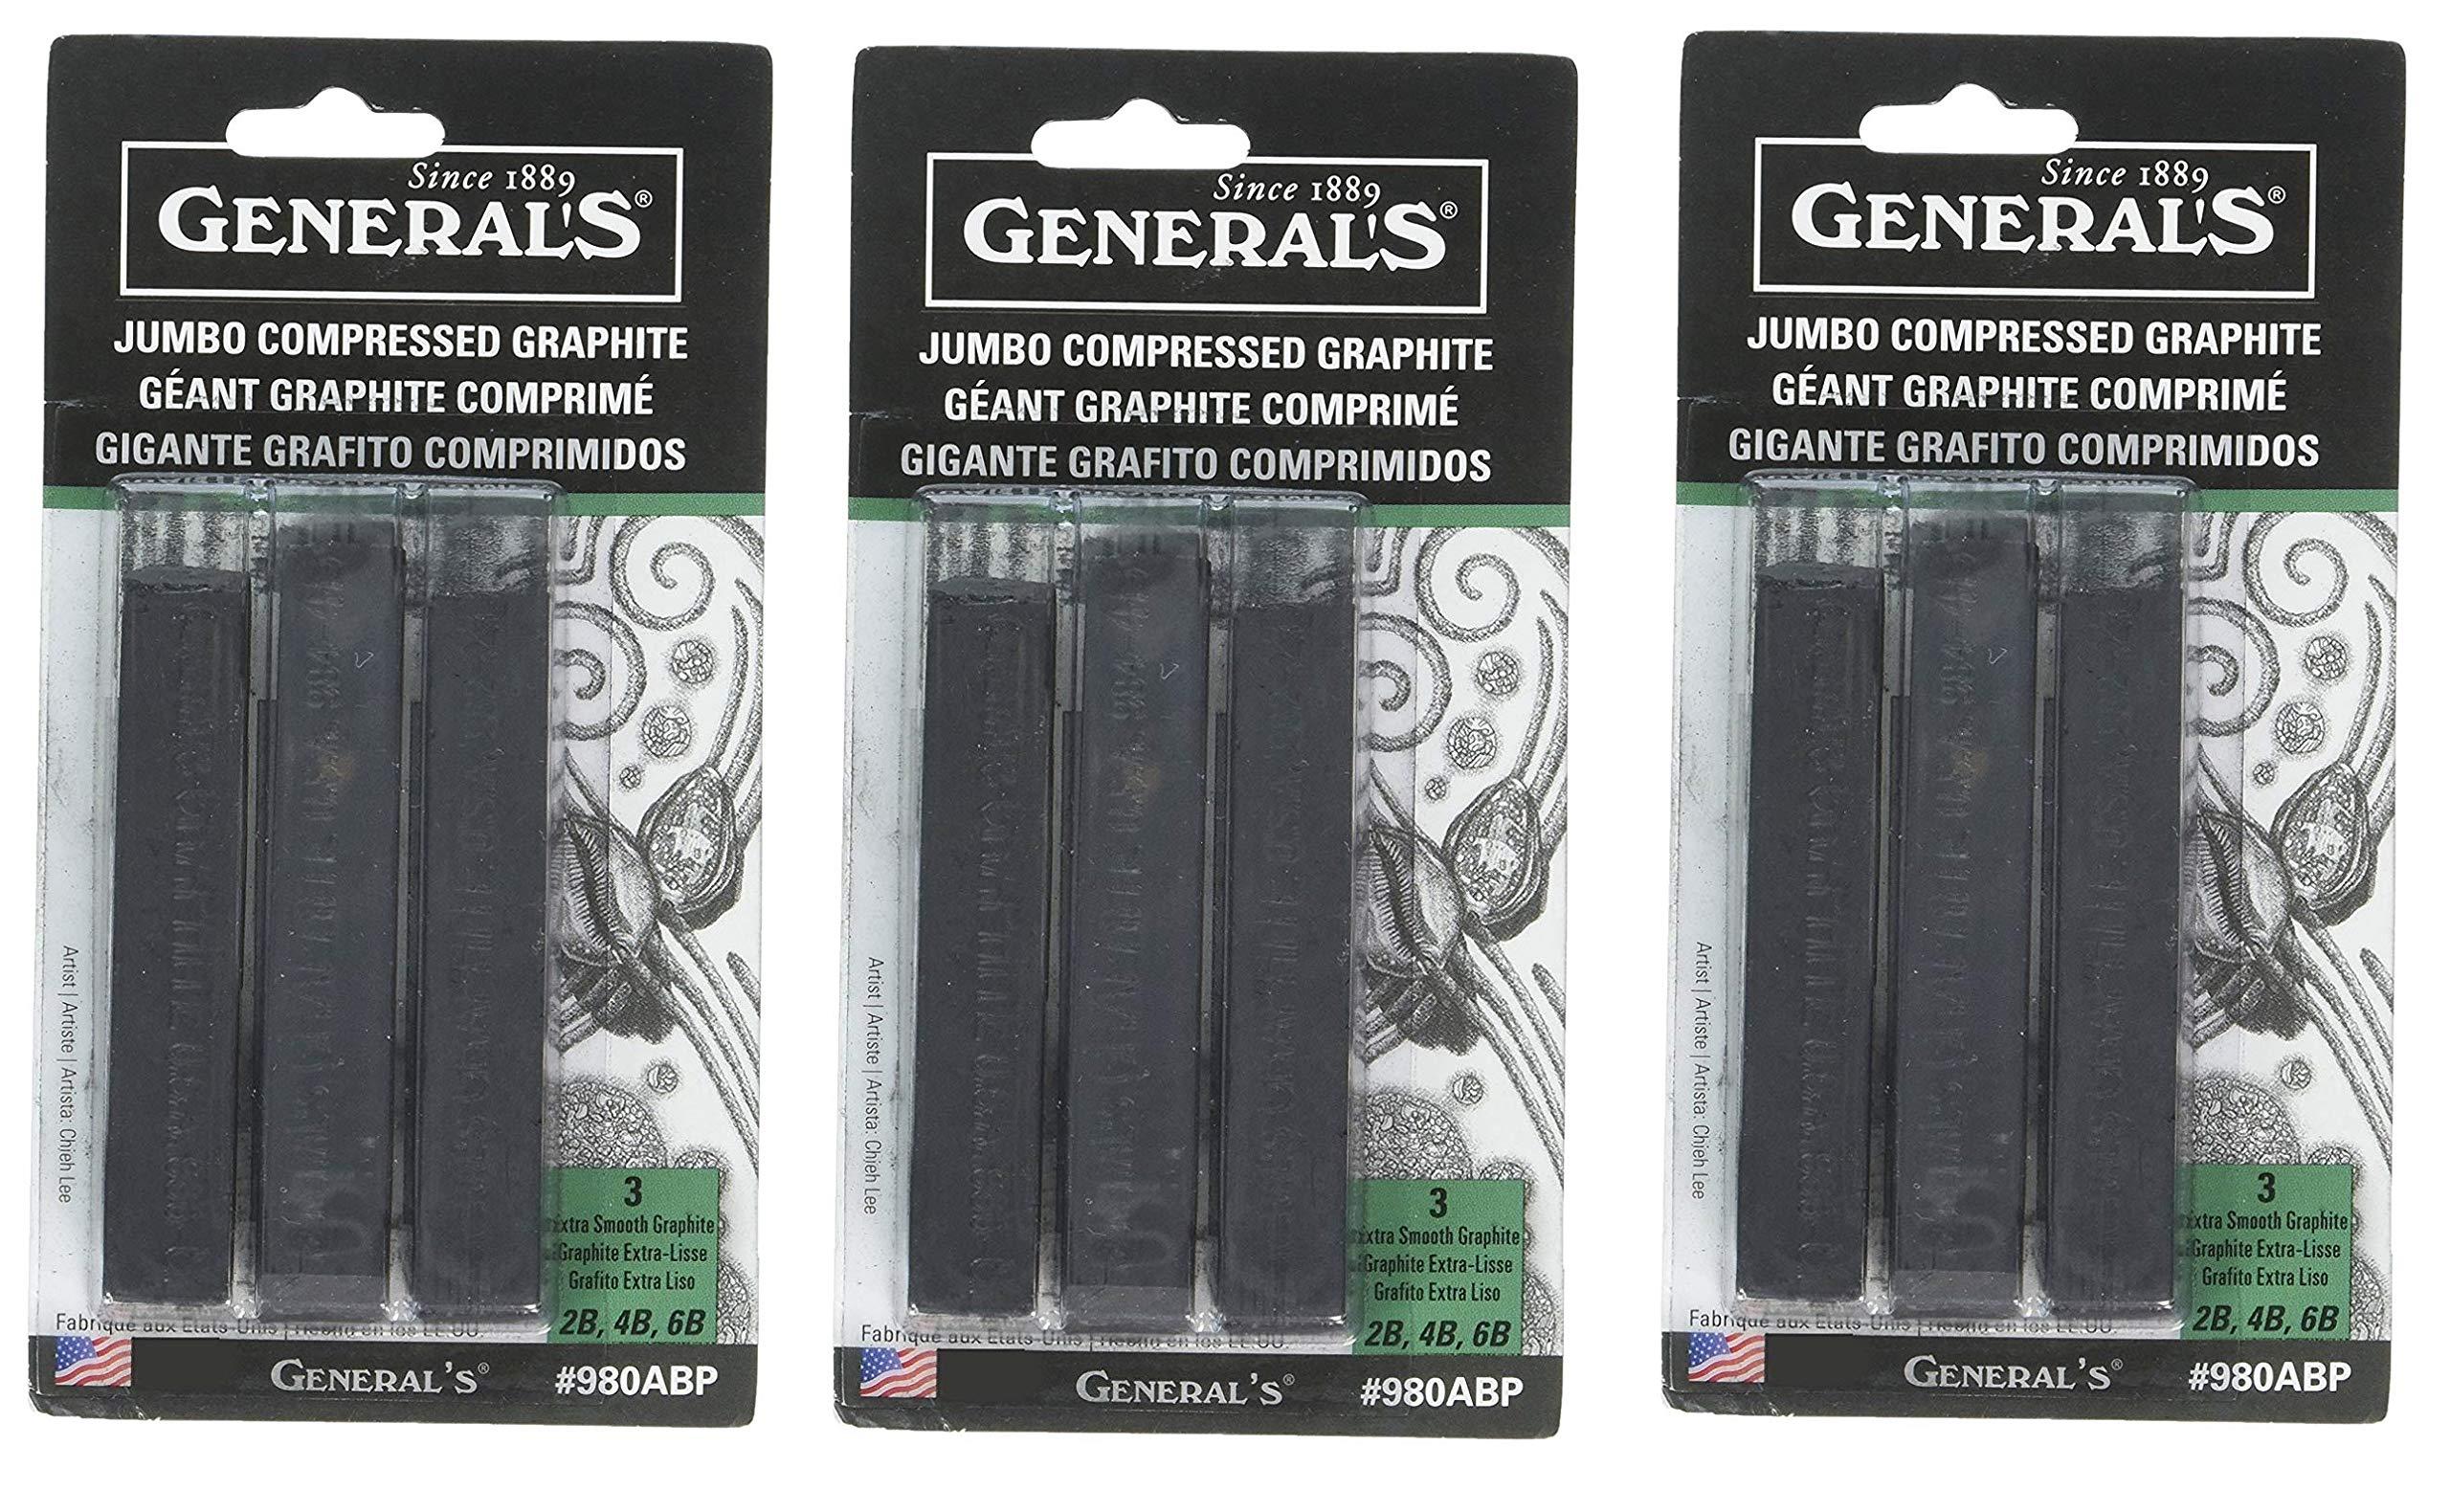 GENERAL'S 980ABP Jumbo Graphite Sticks (3 Pack) (Тhrее Pаck) by GENERAL'S